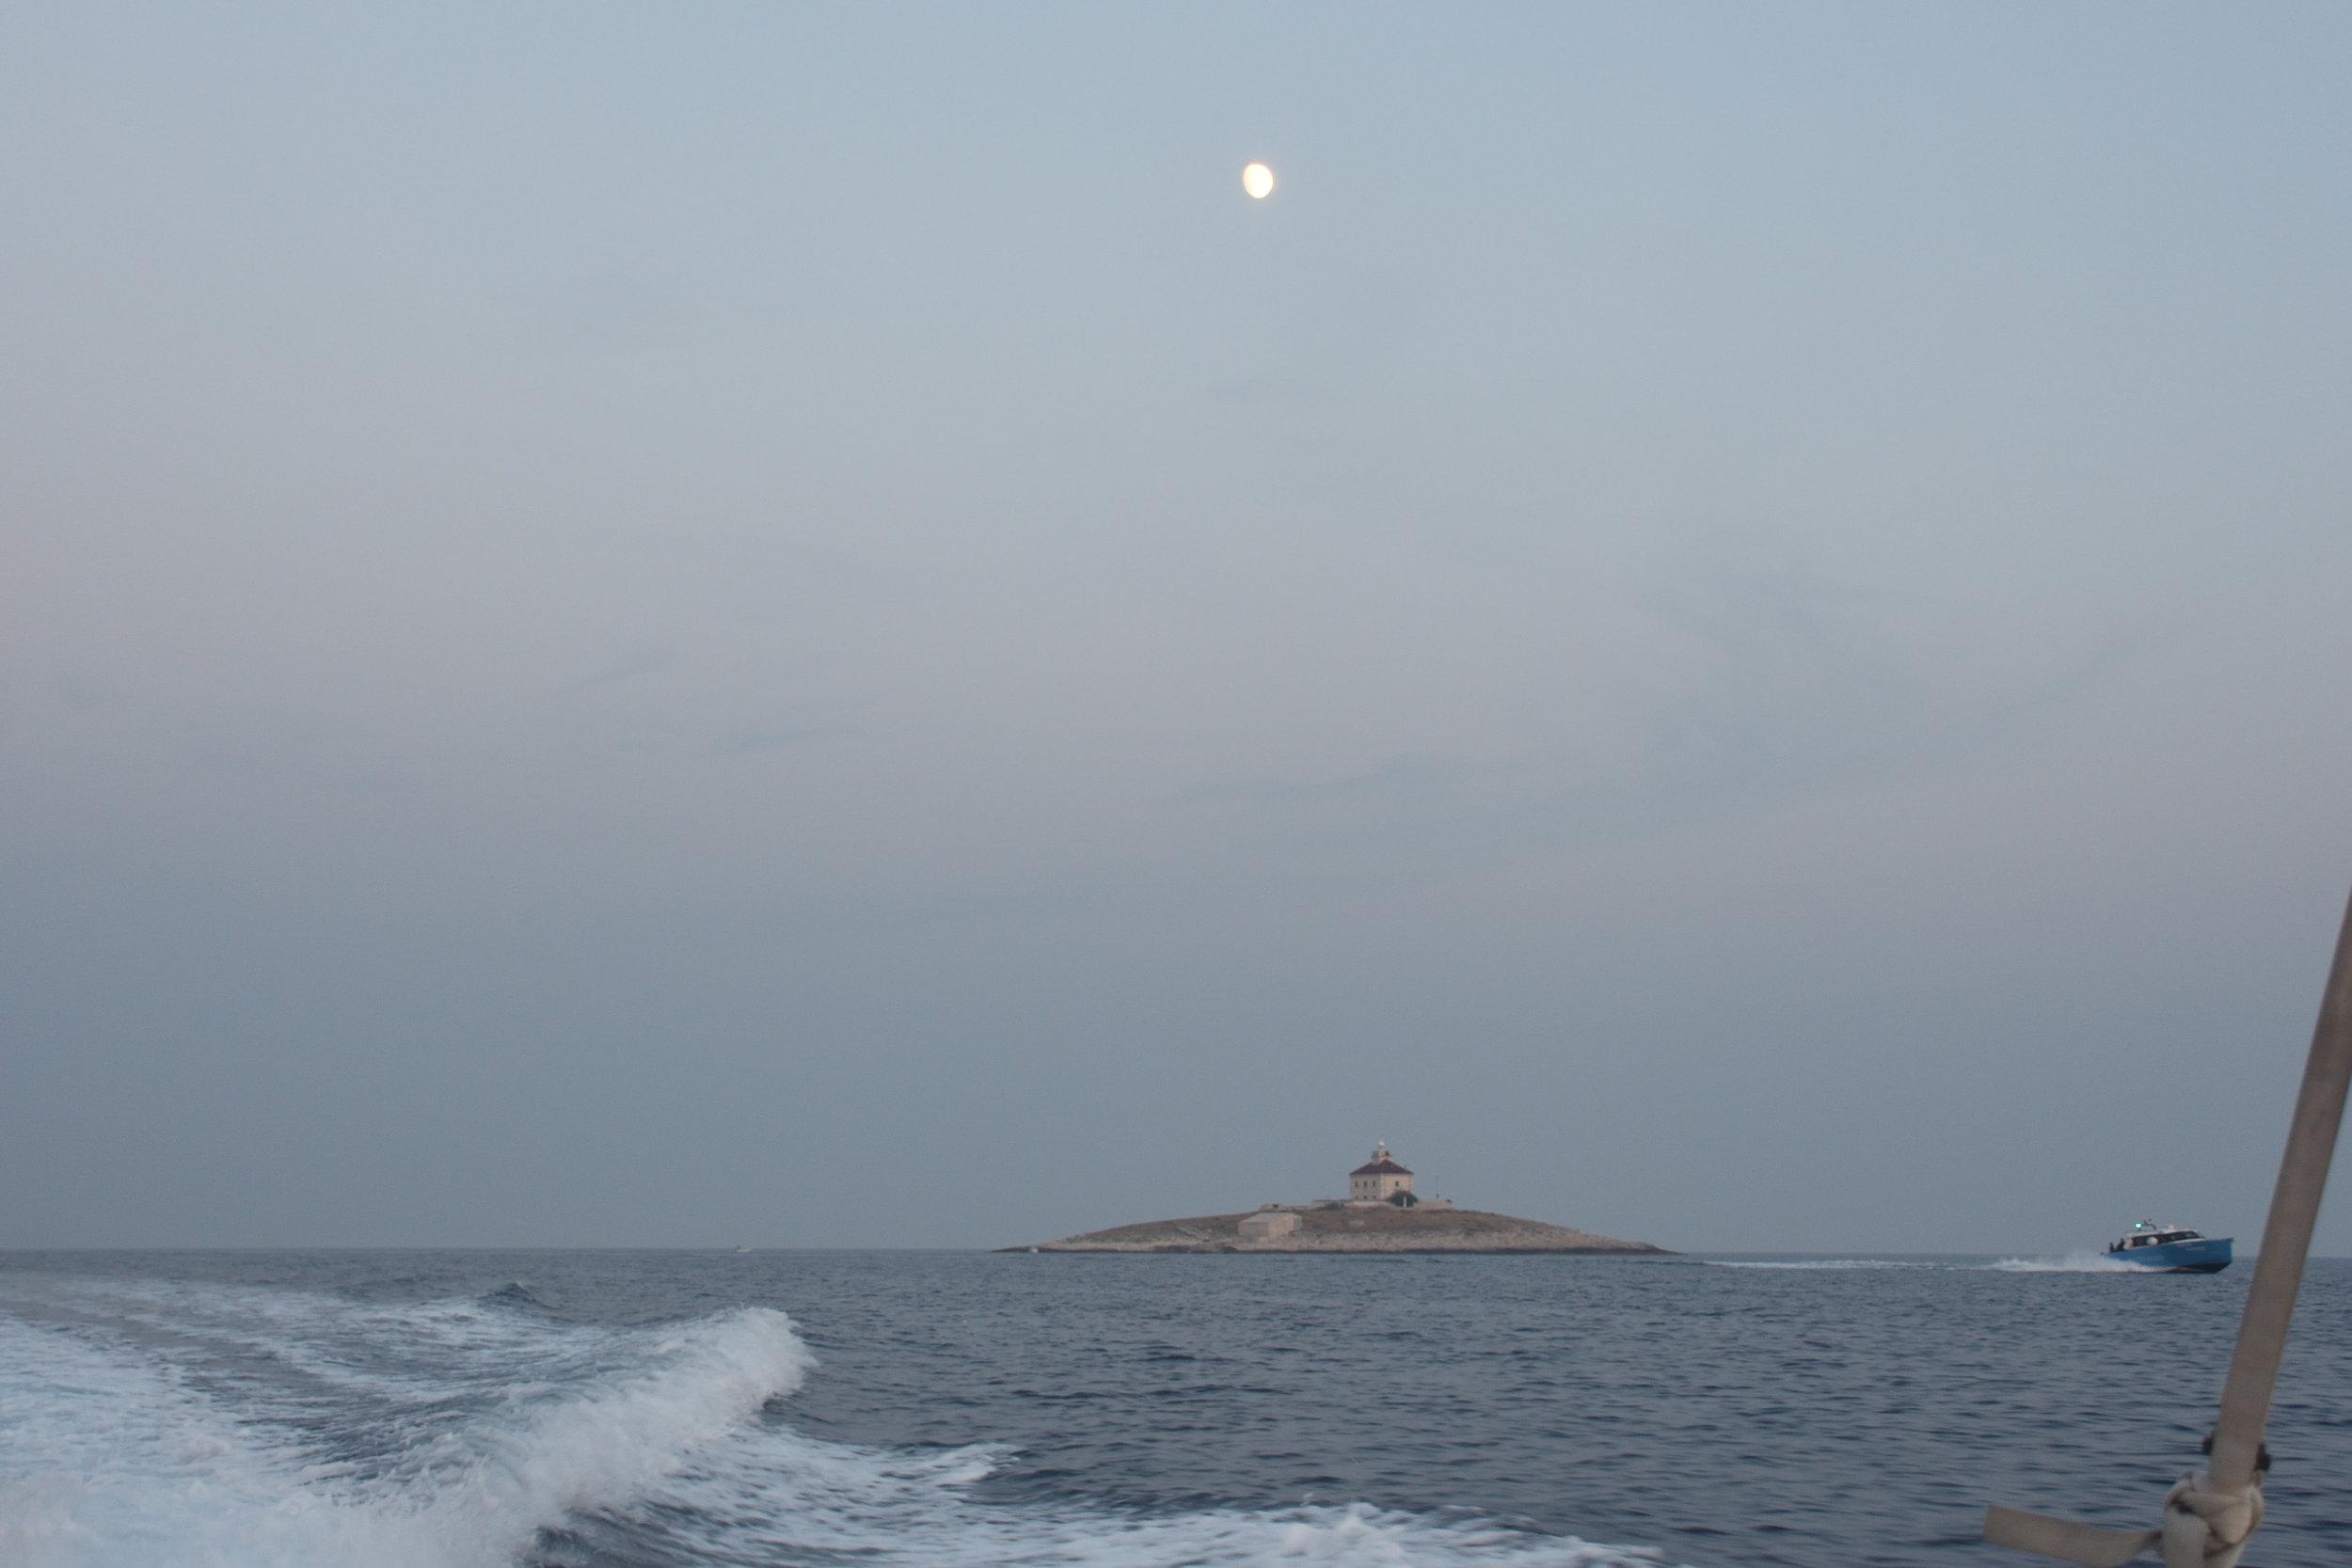 Going home.Adriatic Sea, Croatia 2016